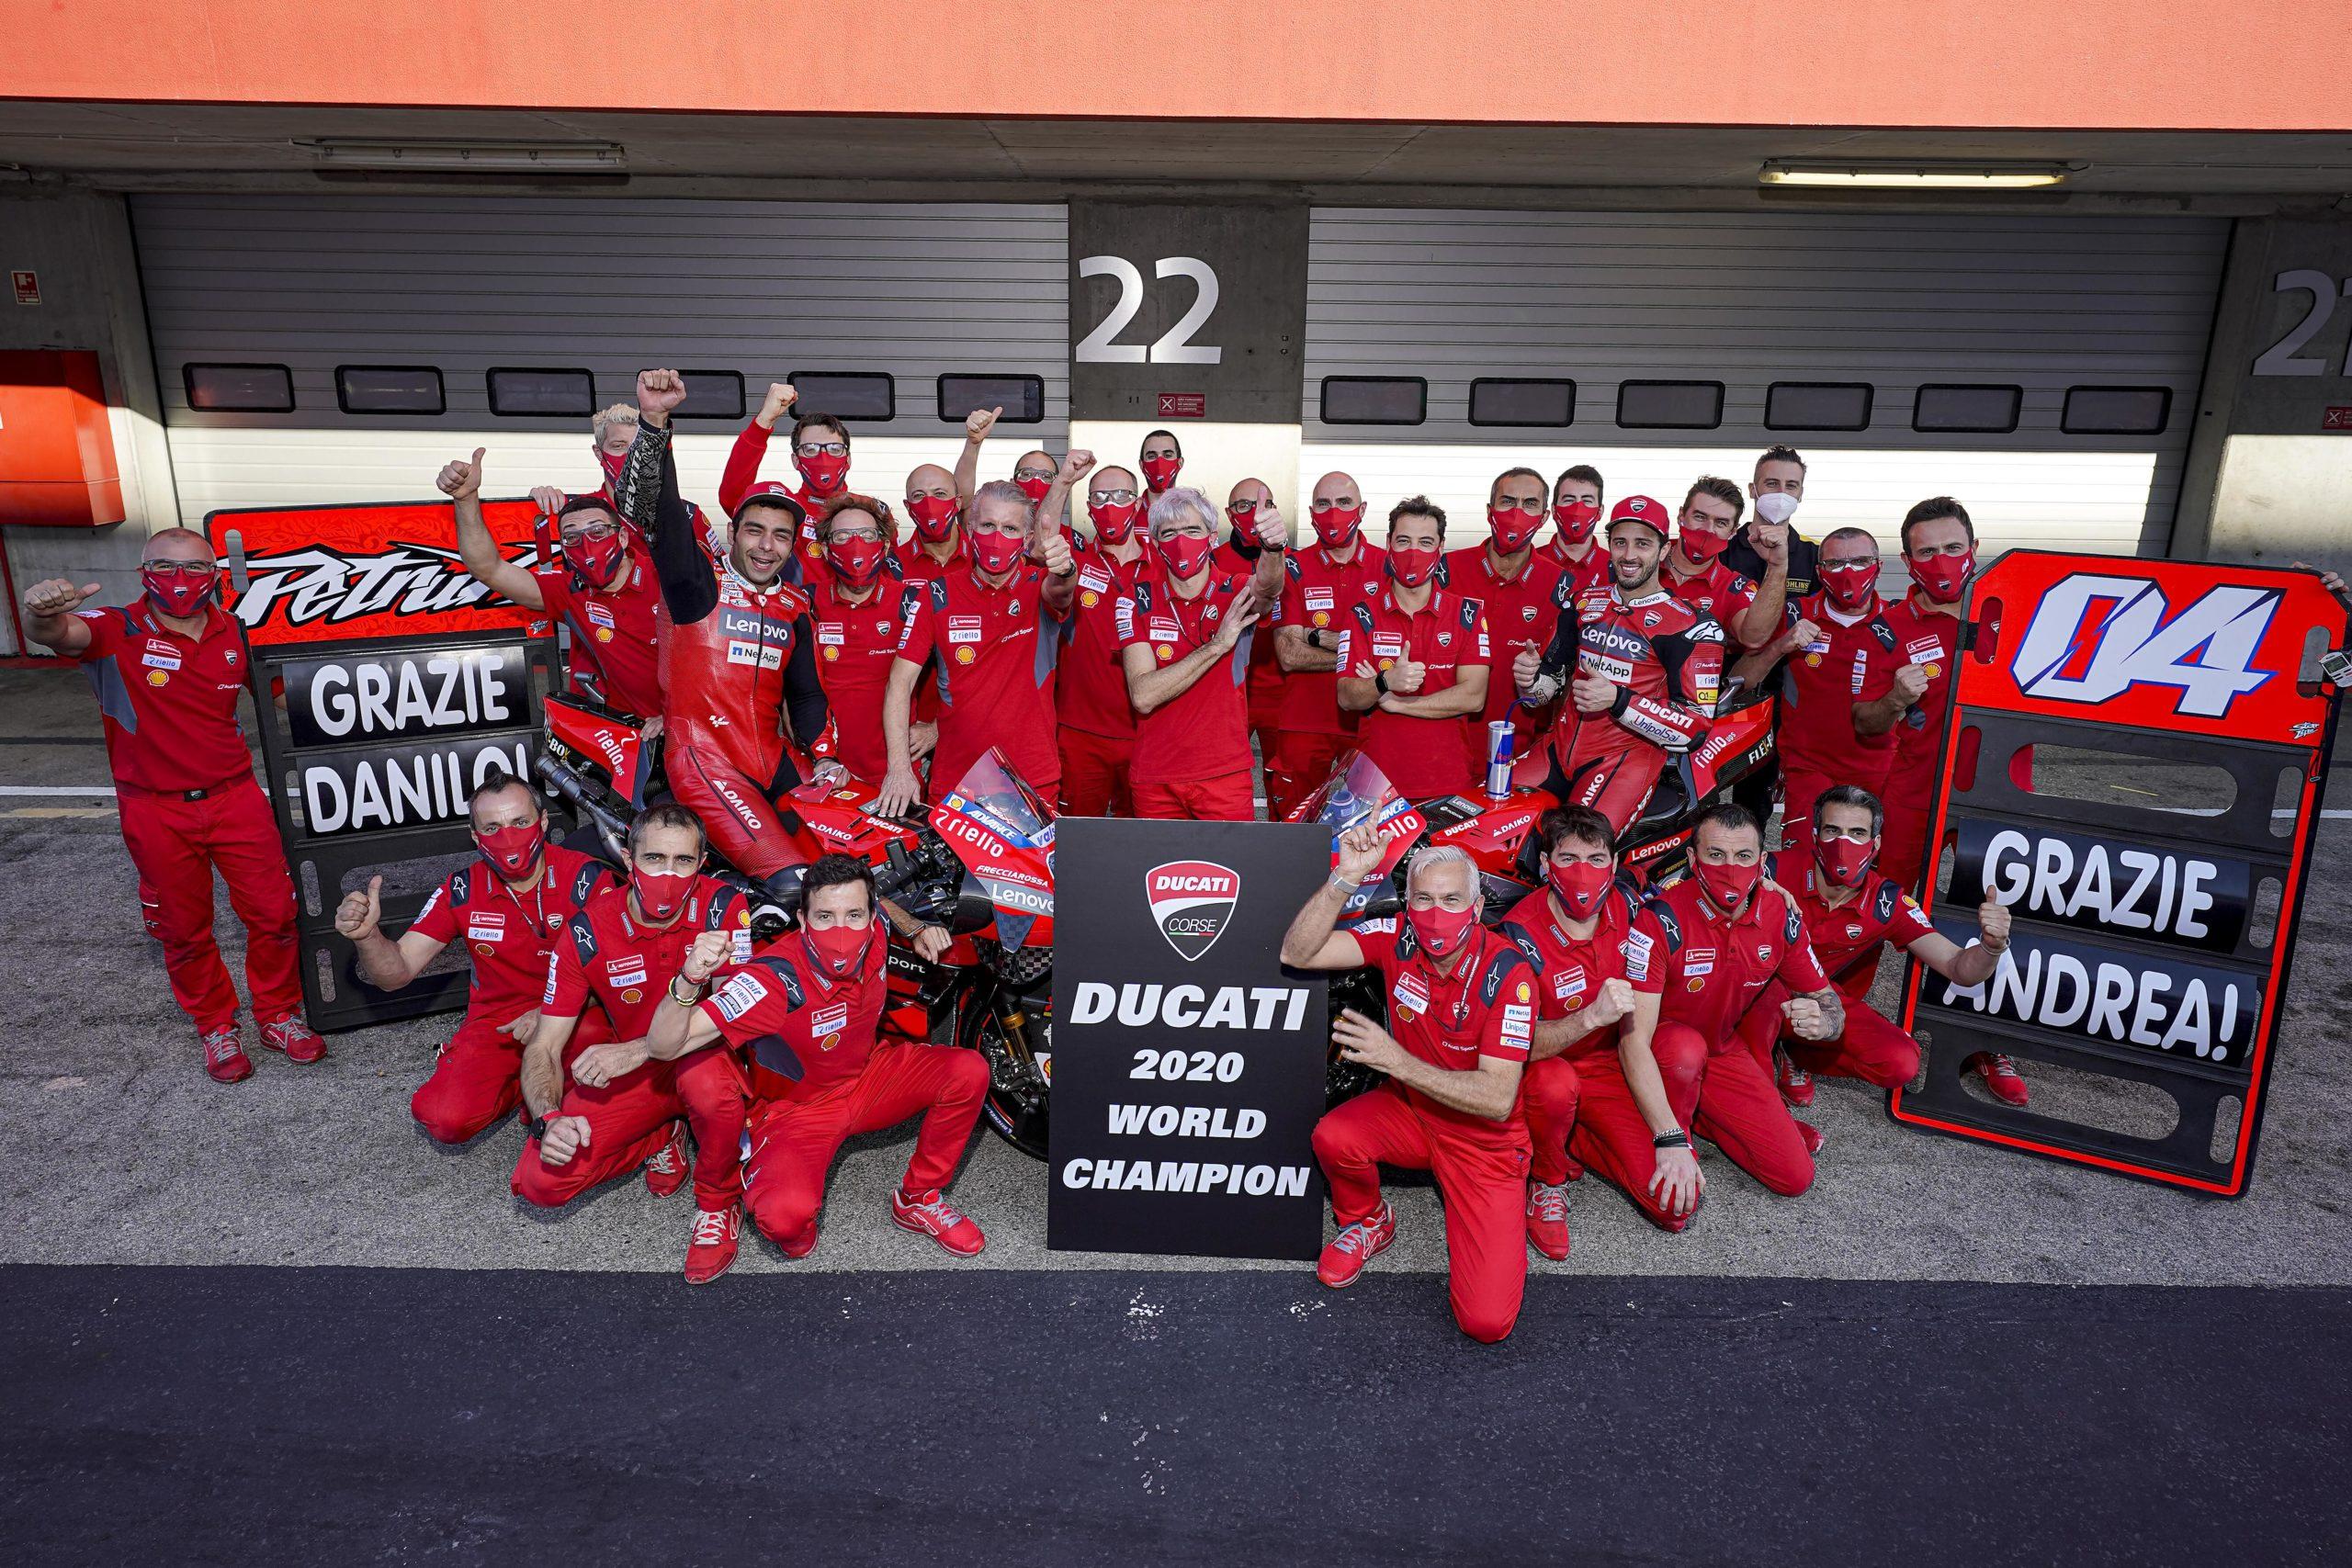 Ducati Team is 2020 Constructors' World Champion